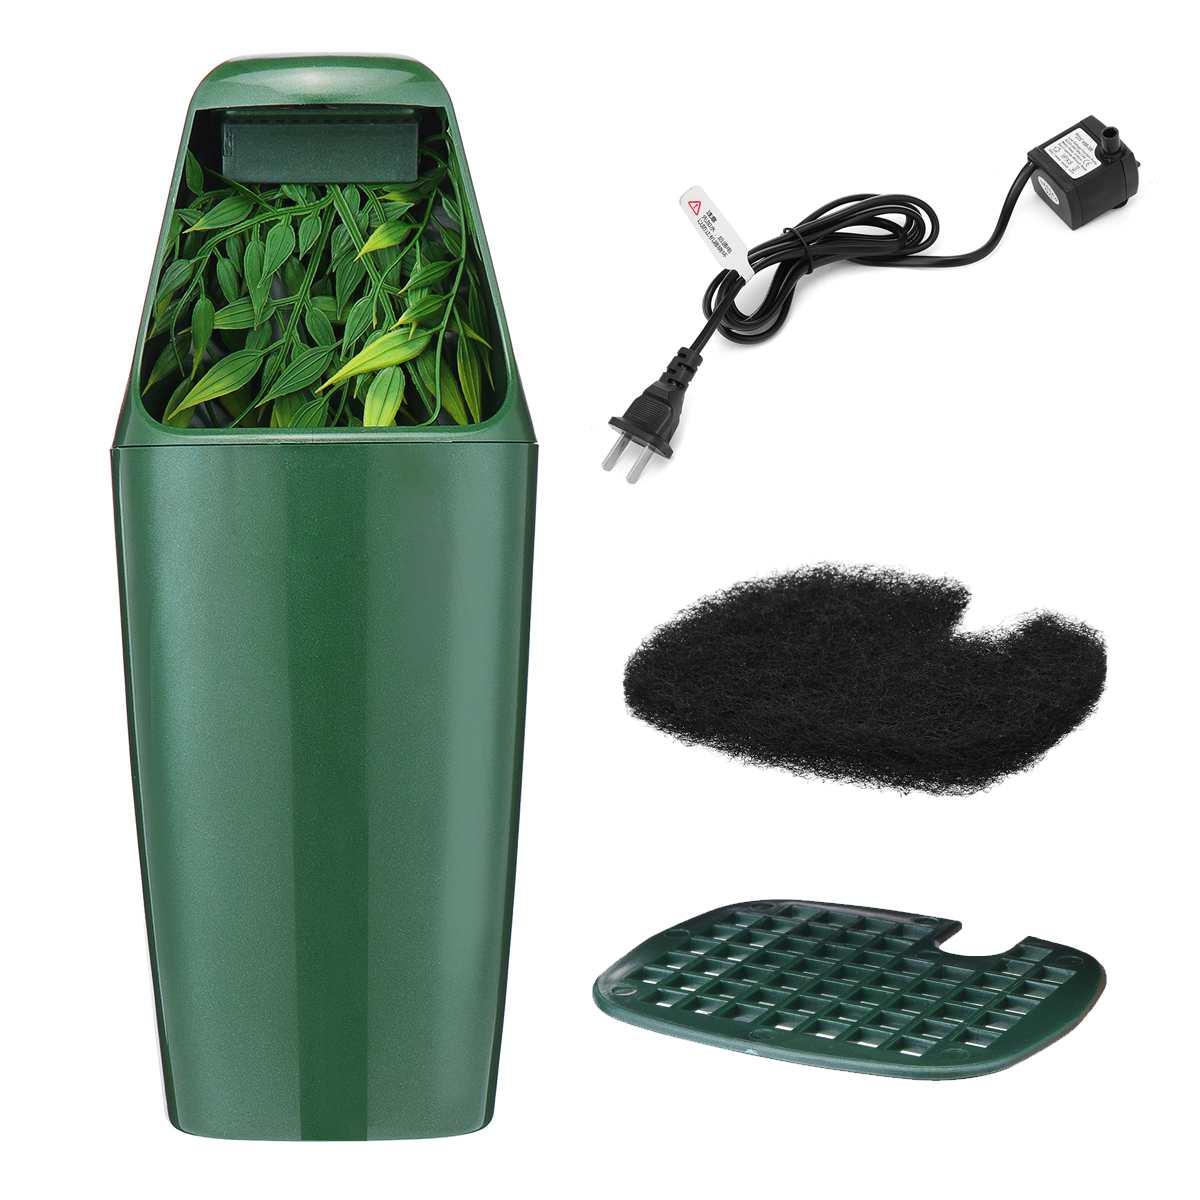 110V/220V Reptile Drinking Water Filter Fountain Green Feeding Chameleon Lizard ABS Dispenser Terrarium Reptiles Supplies